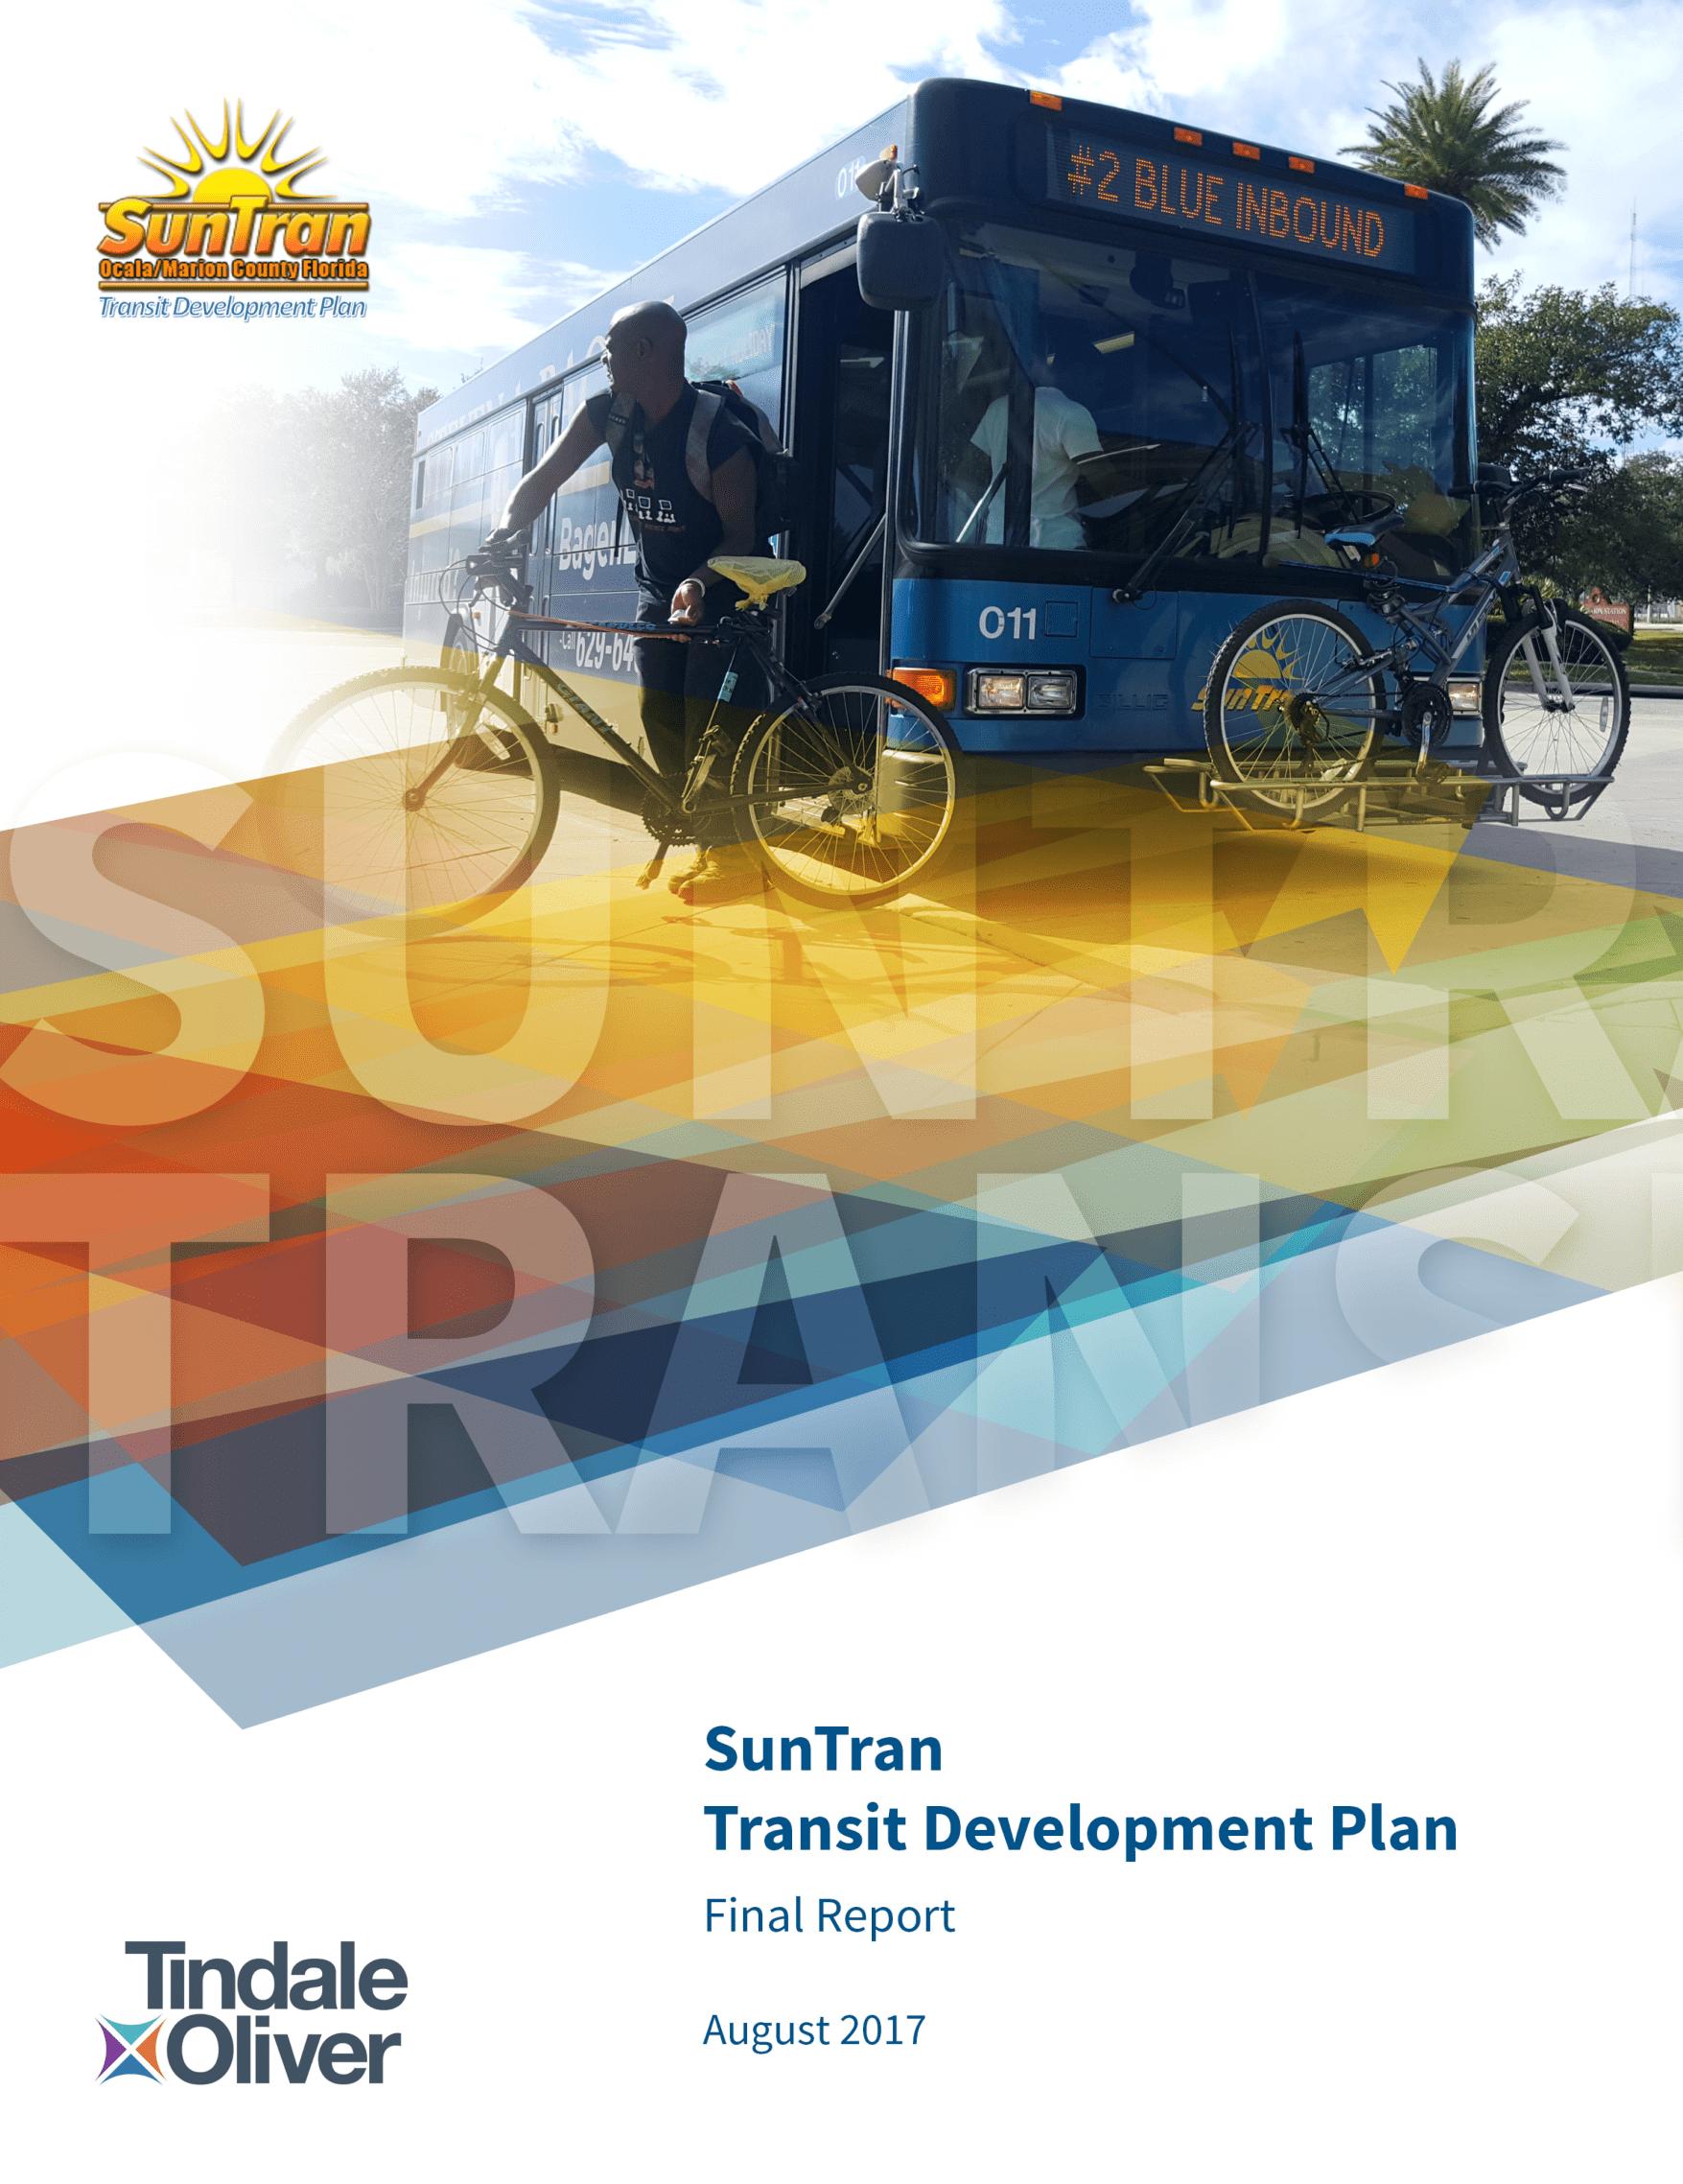 Transit Development Plan